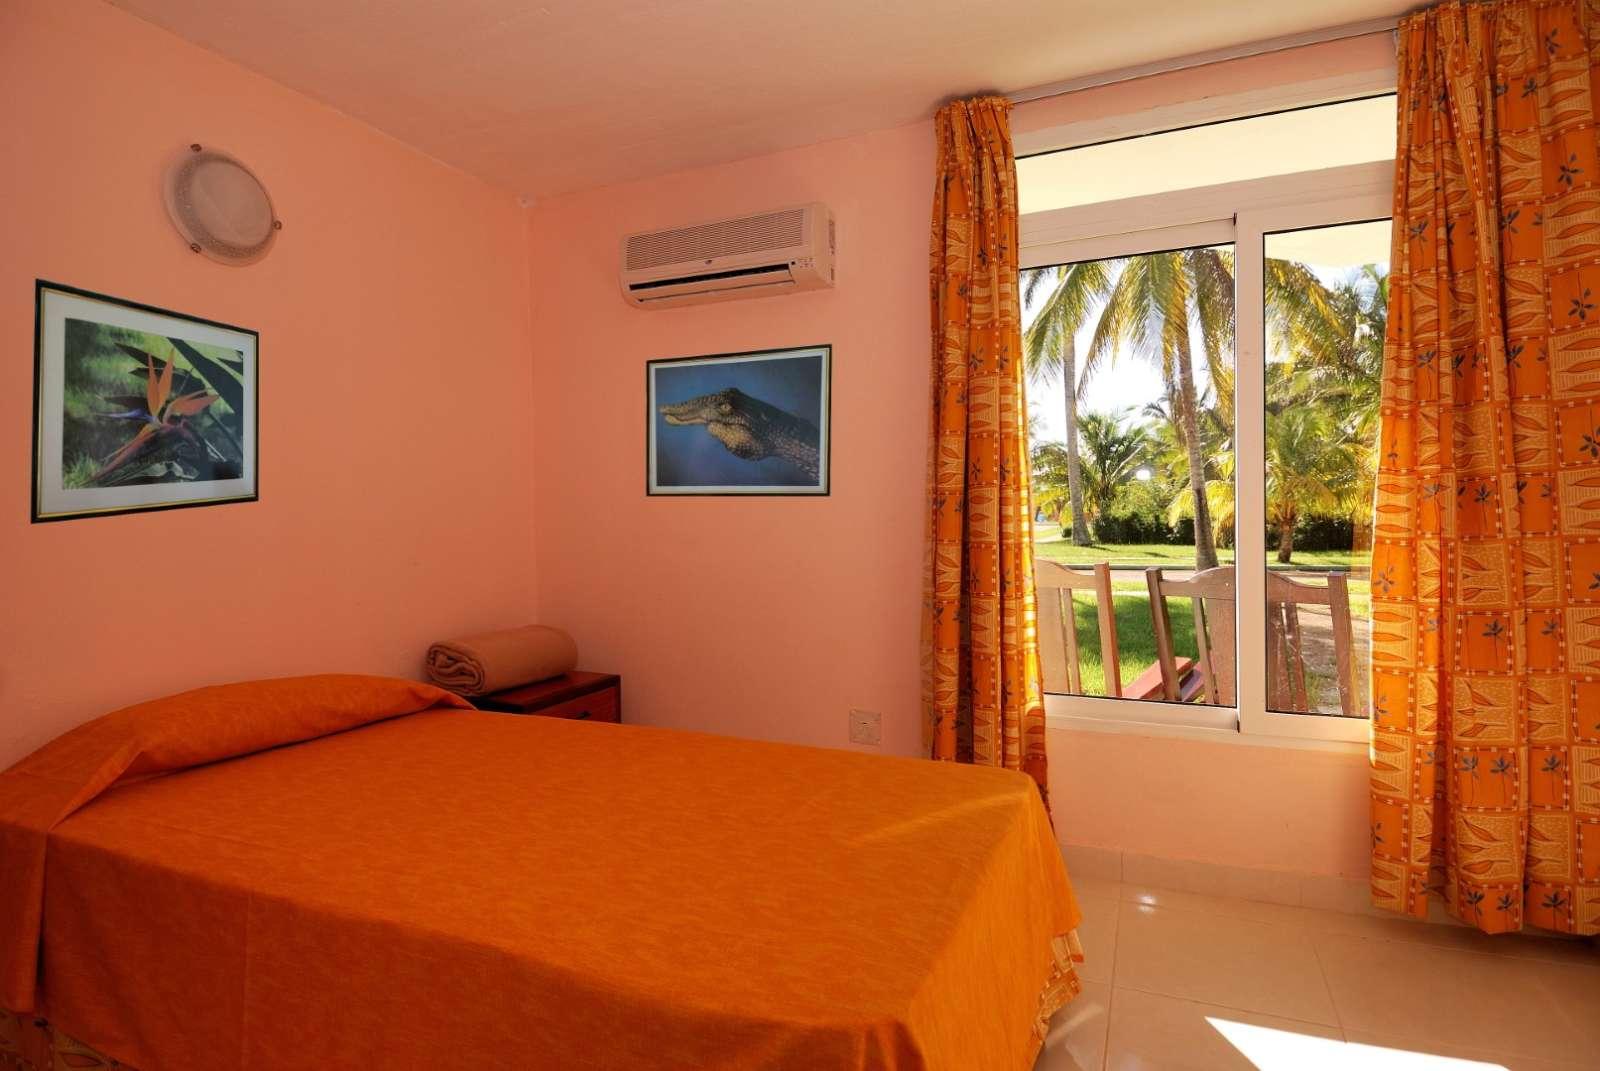 Bedroom at Hotel Playa Larga